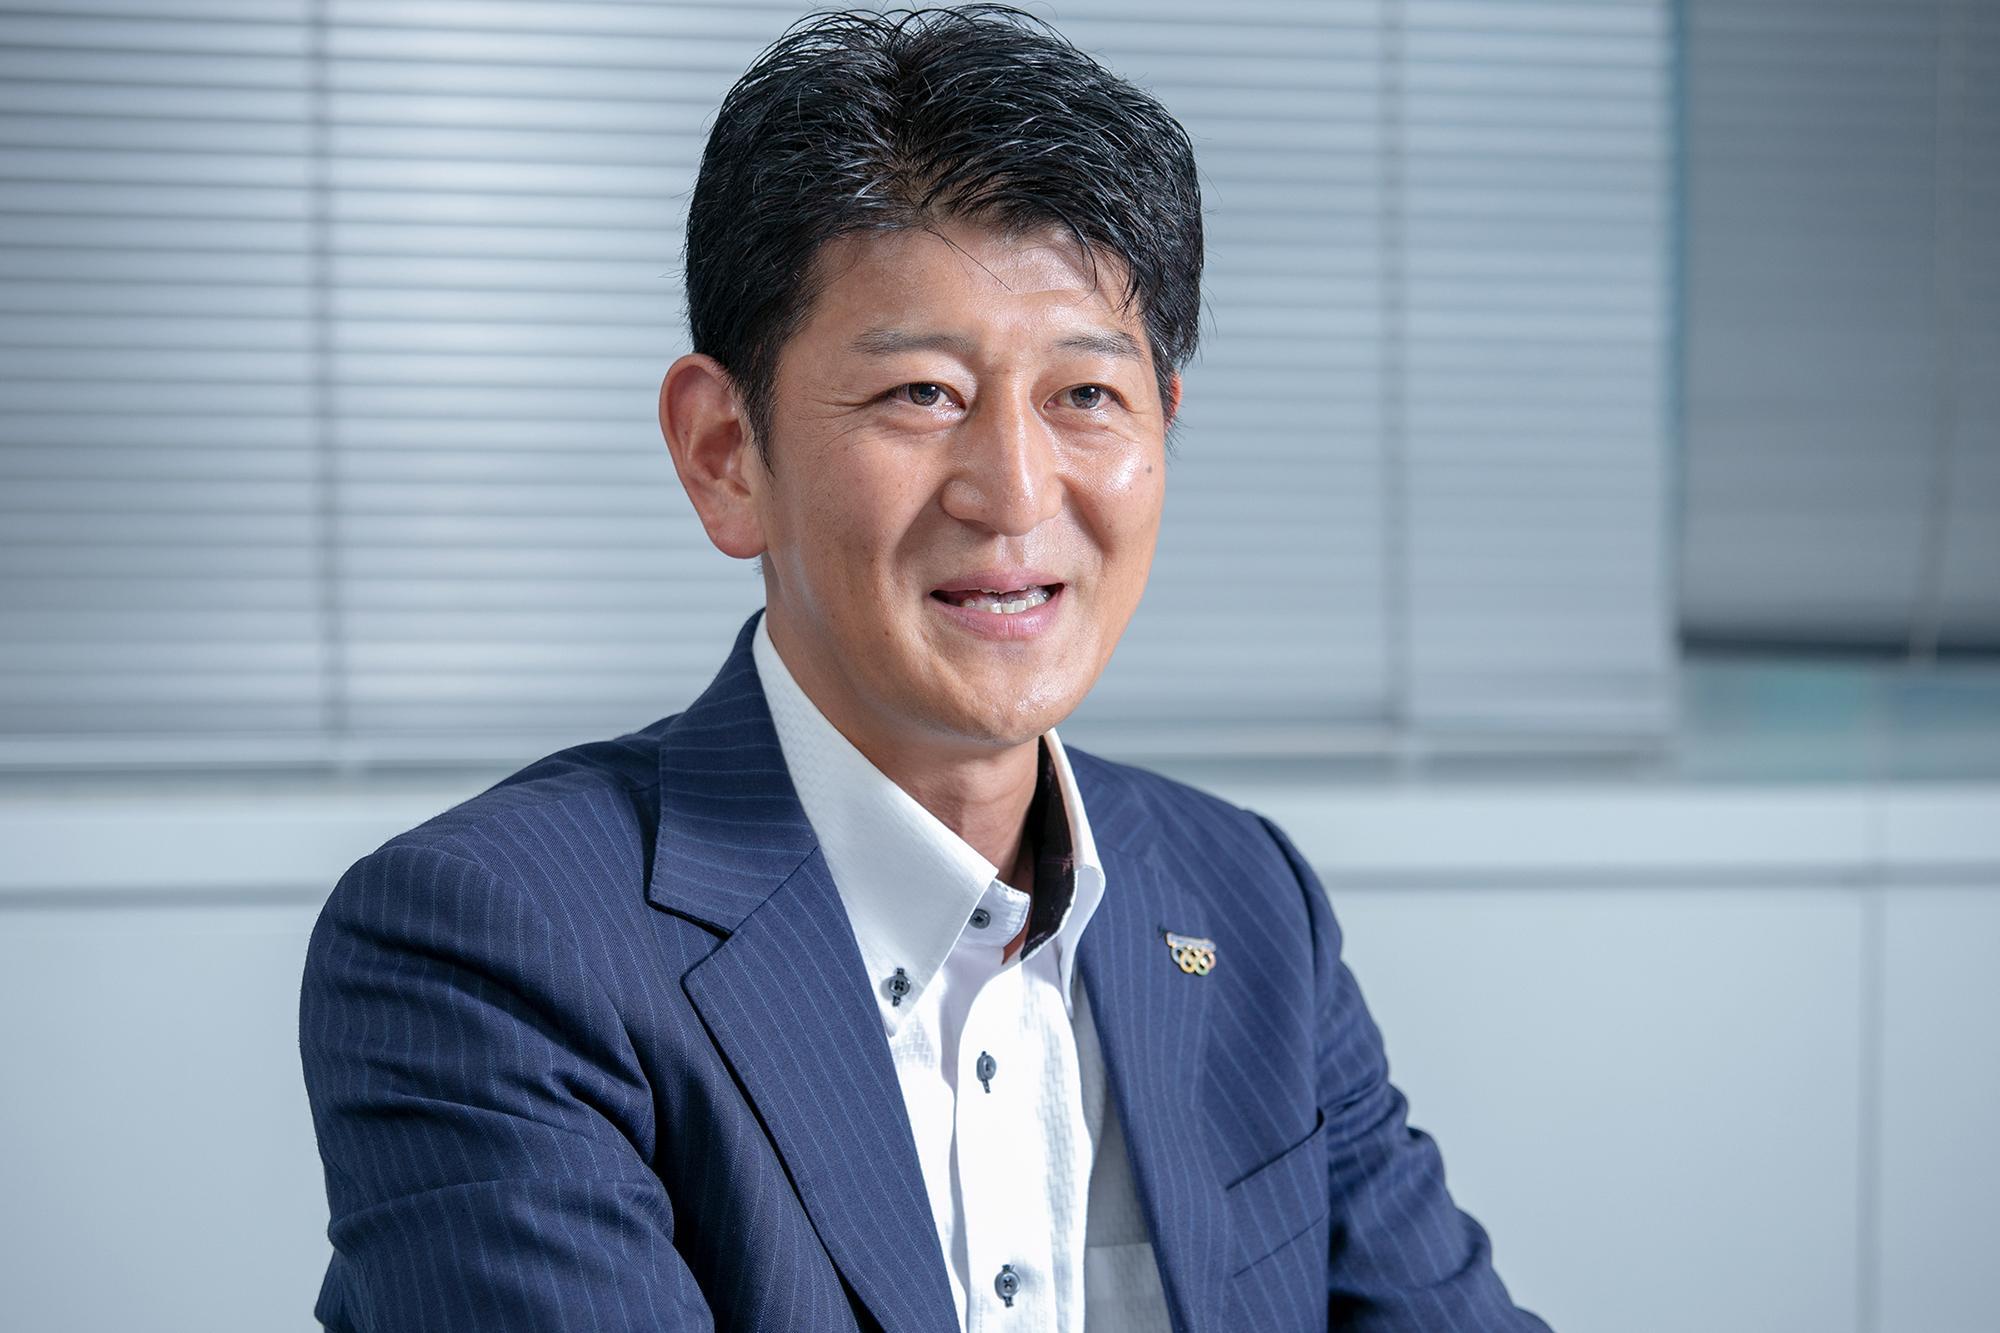 Photo: Kengo Fukuma, Chief, Solution Team No. 2, Sales & Marketing Dept., Business Solutions Division, Panasonic Corporation